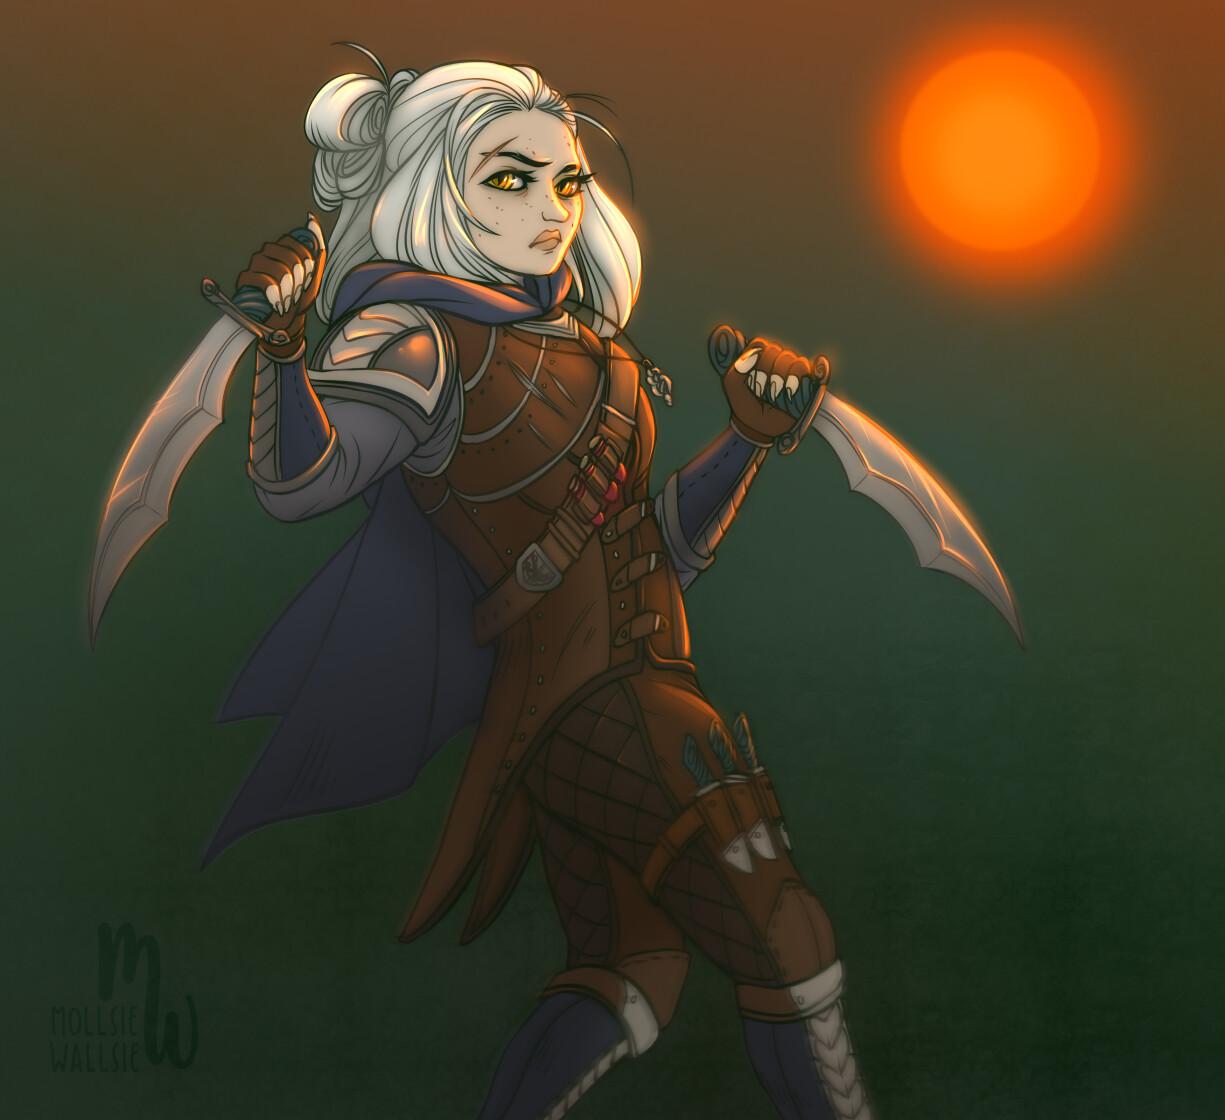 Witcher lass - School of the Viper (original character)